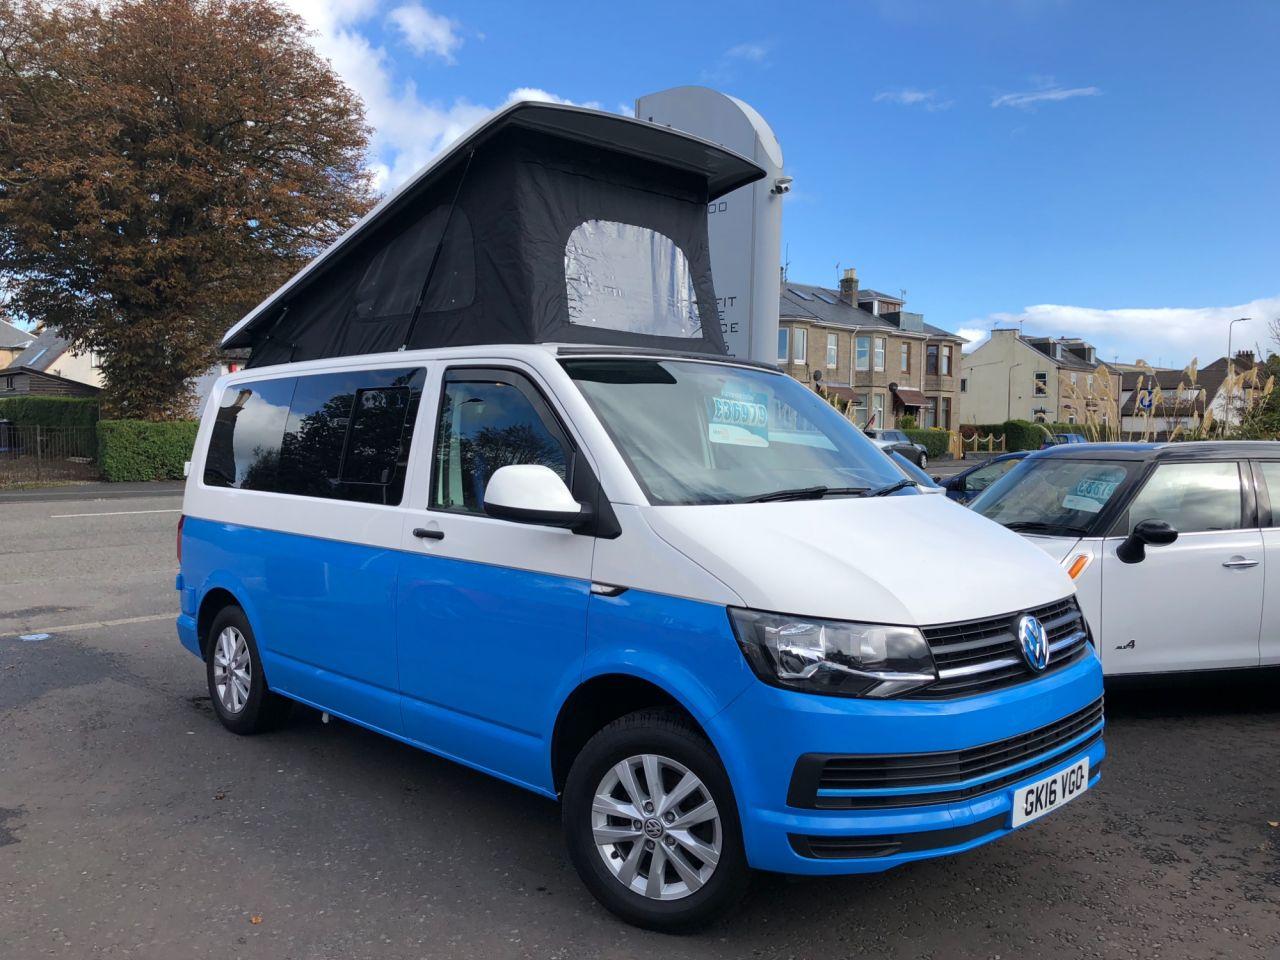 volkswagen t6 campervan brand new 4 berth camper conversion t28 tdi